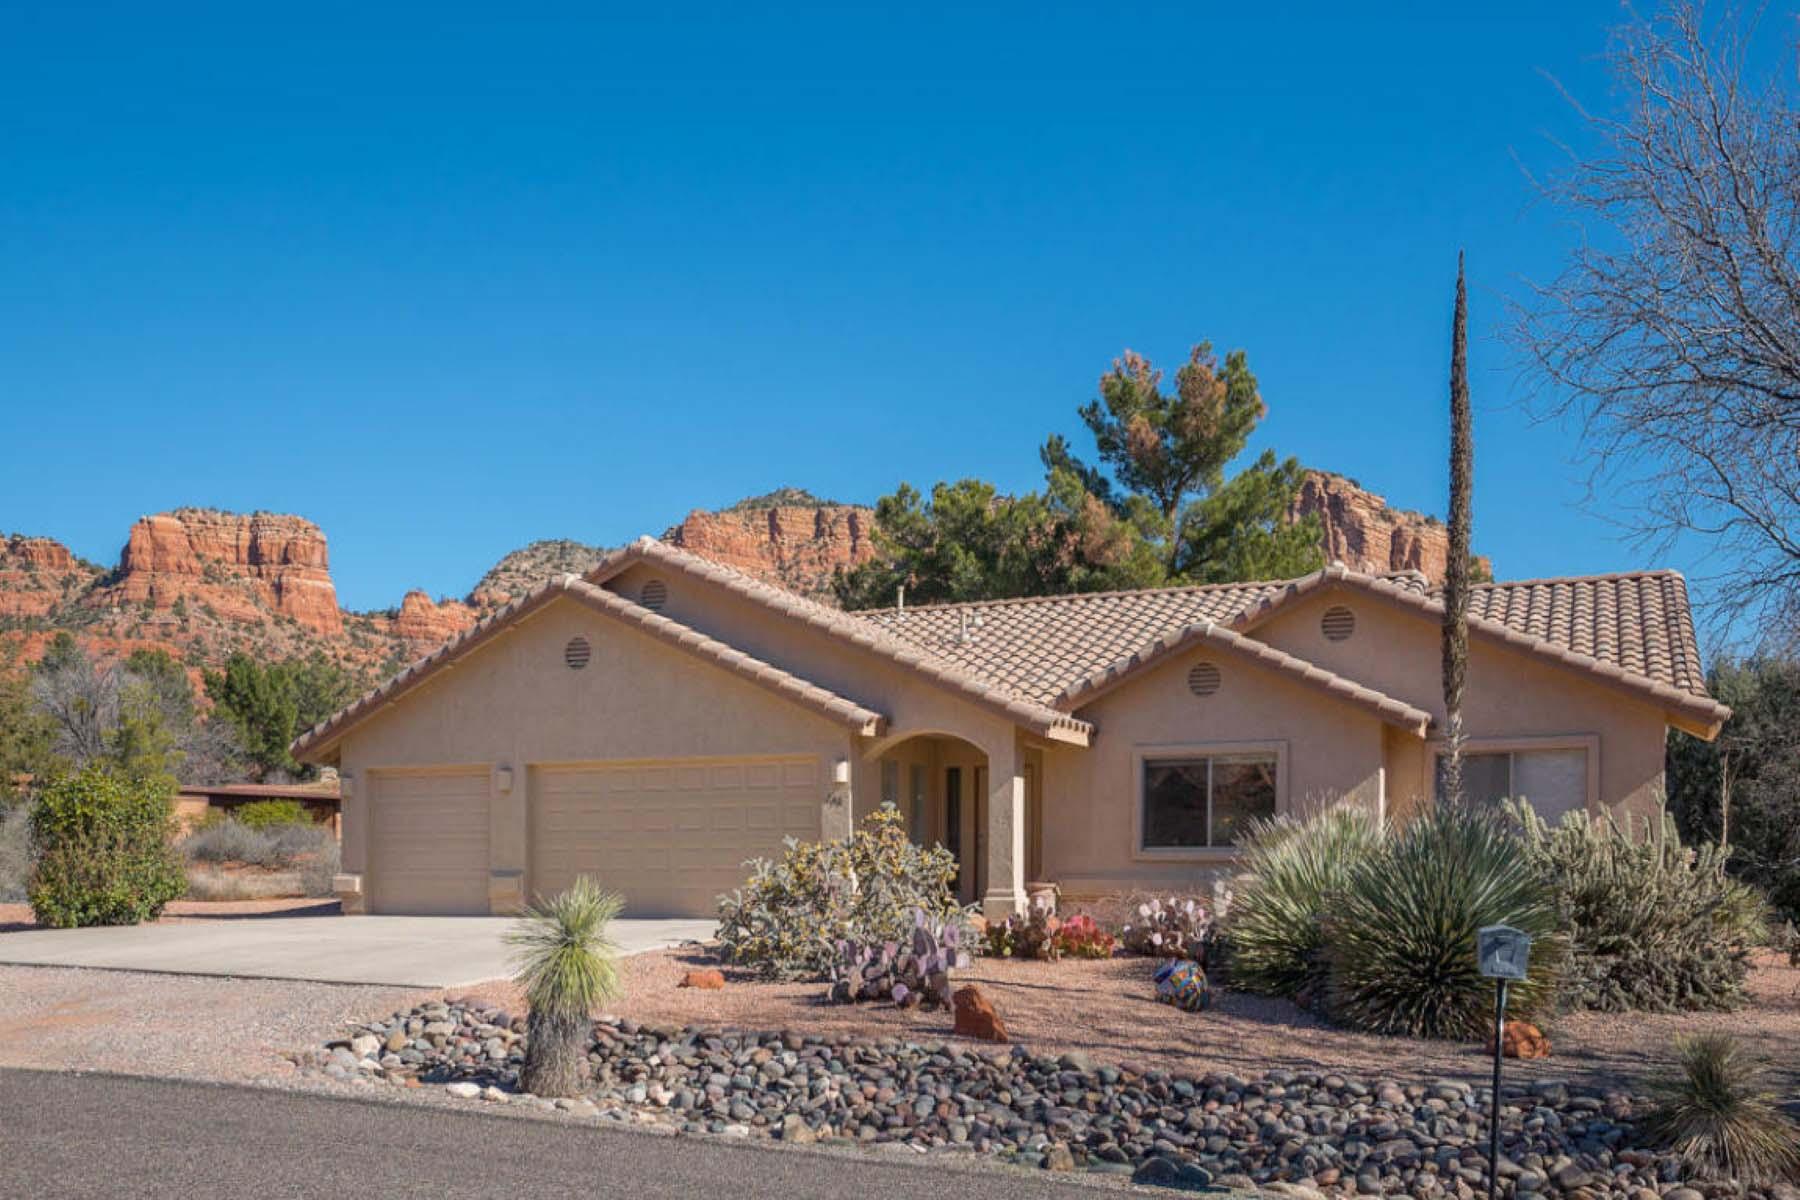 Tek Ailelik Ev için Satış at Comfortable, easy and pleasing describe the lifestyle provided by 240 Moons View 240 Moons View Rd Sedona, Arizona 86351 Amerika Birleşik Devletleri